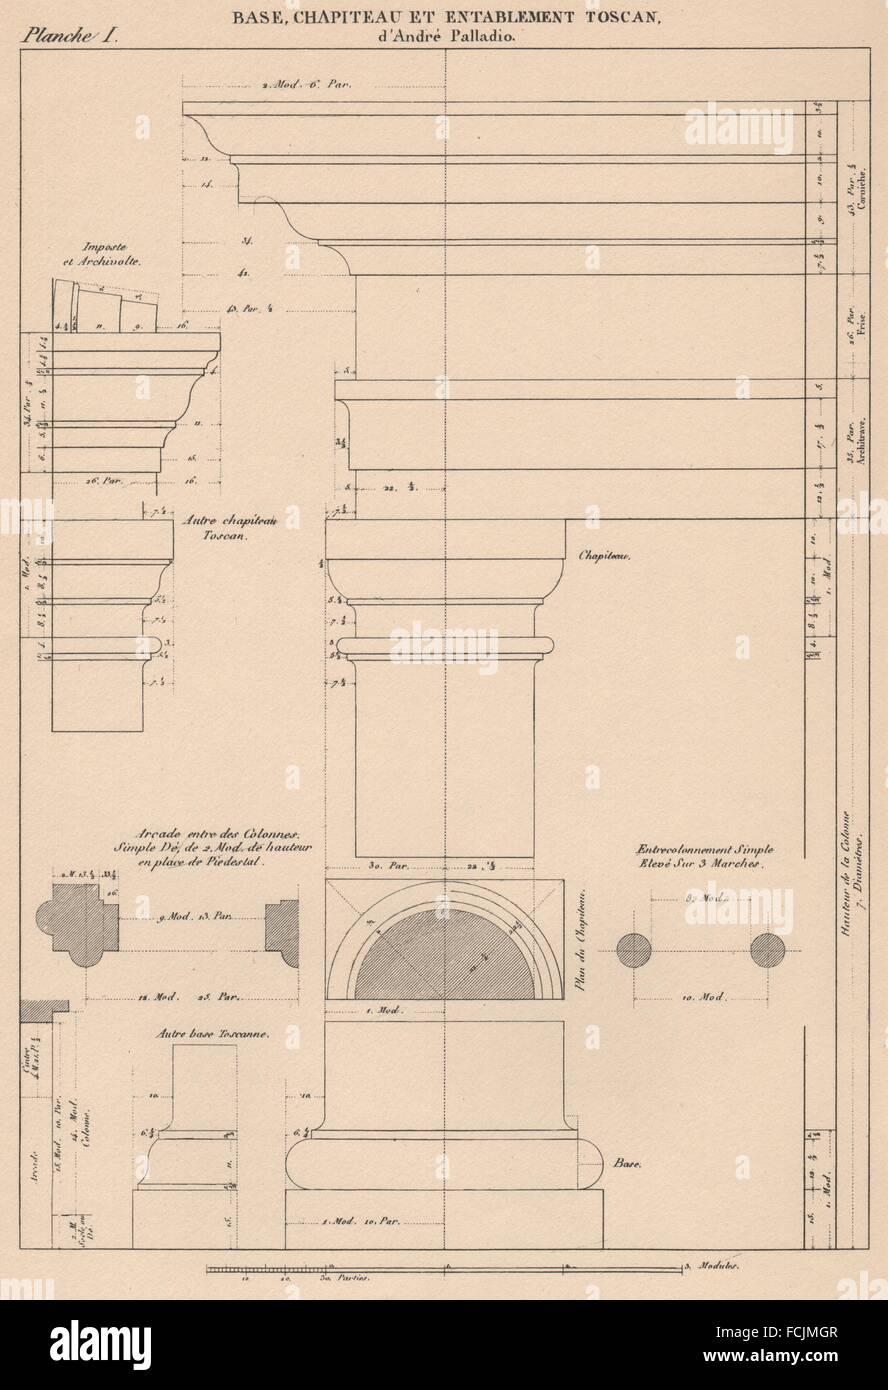 TUSCAN ARCHITECTURE: Base, Capital and Entablature. (Palladio c1518-1580) 1931 - Stock Image